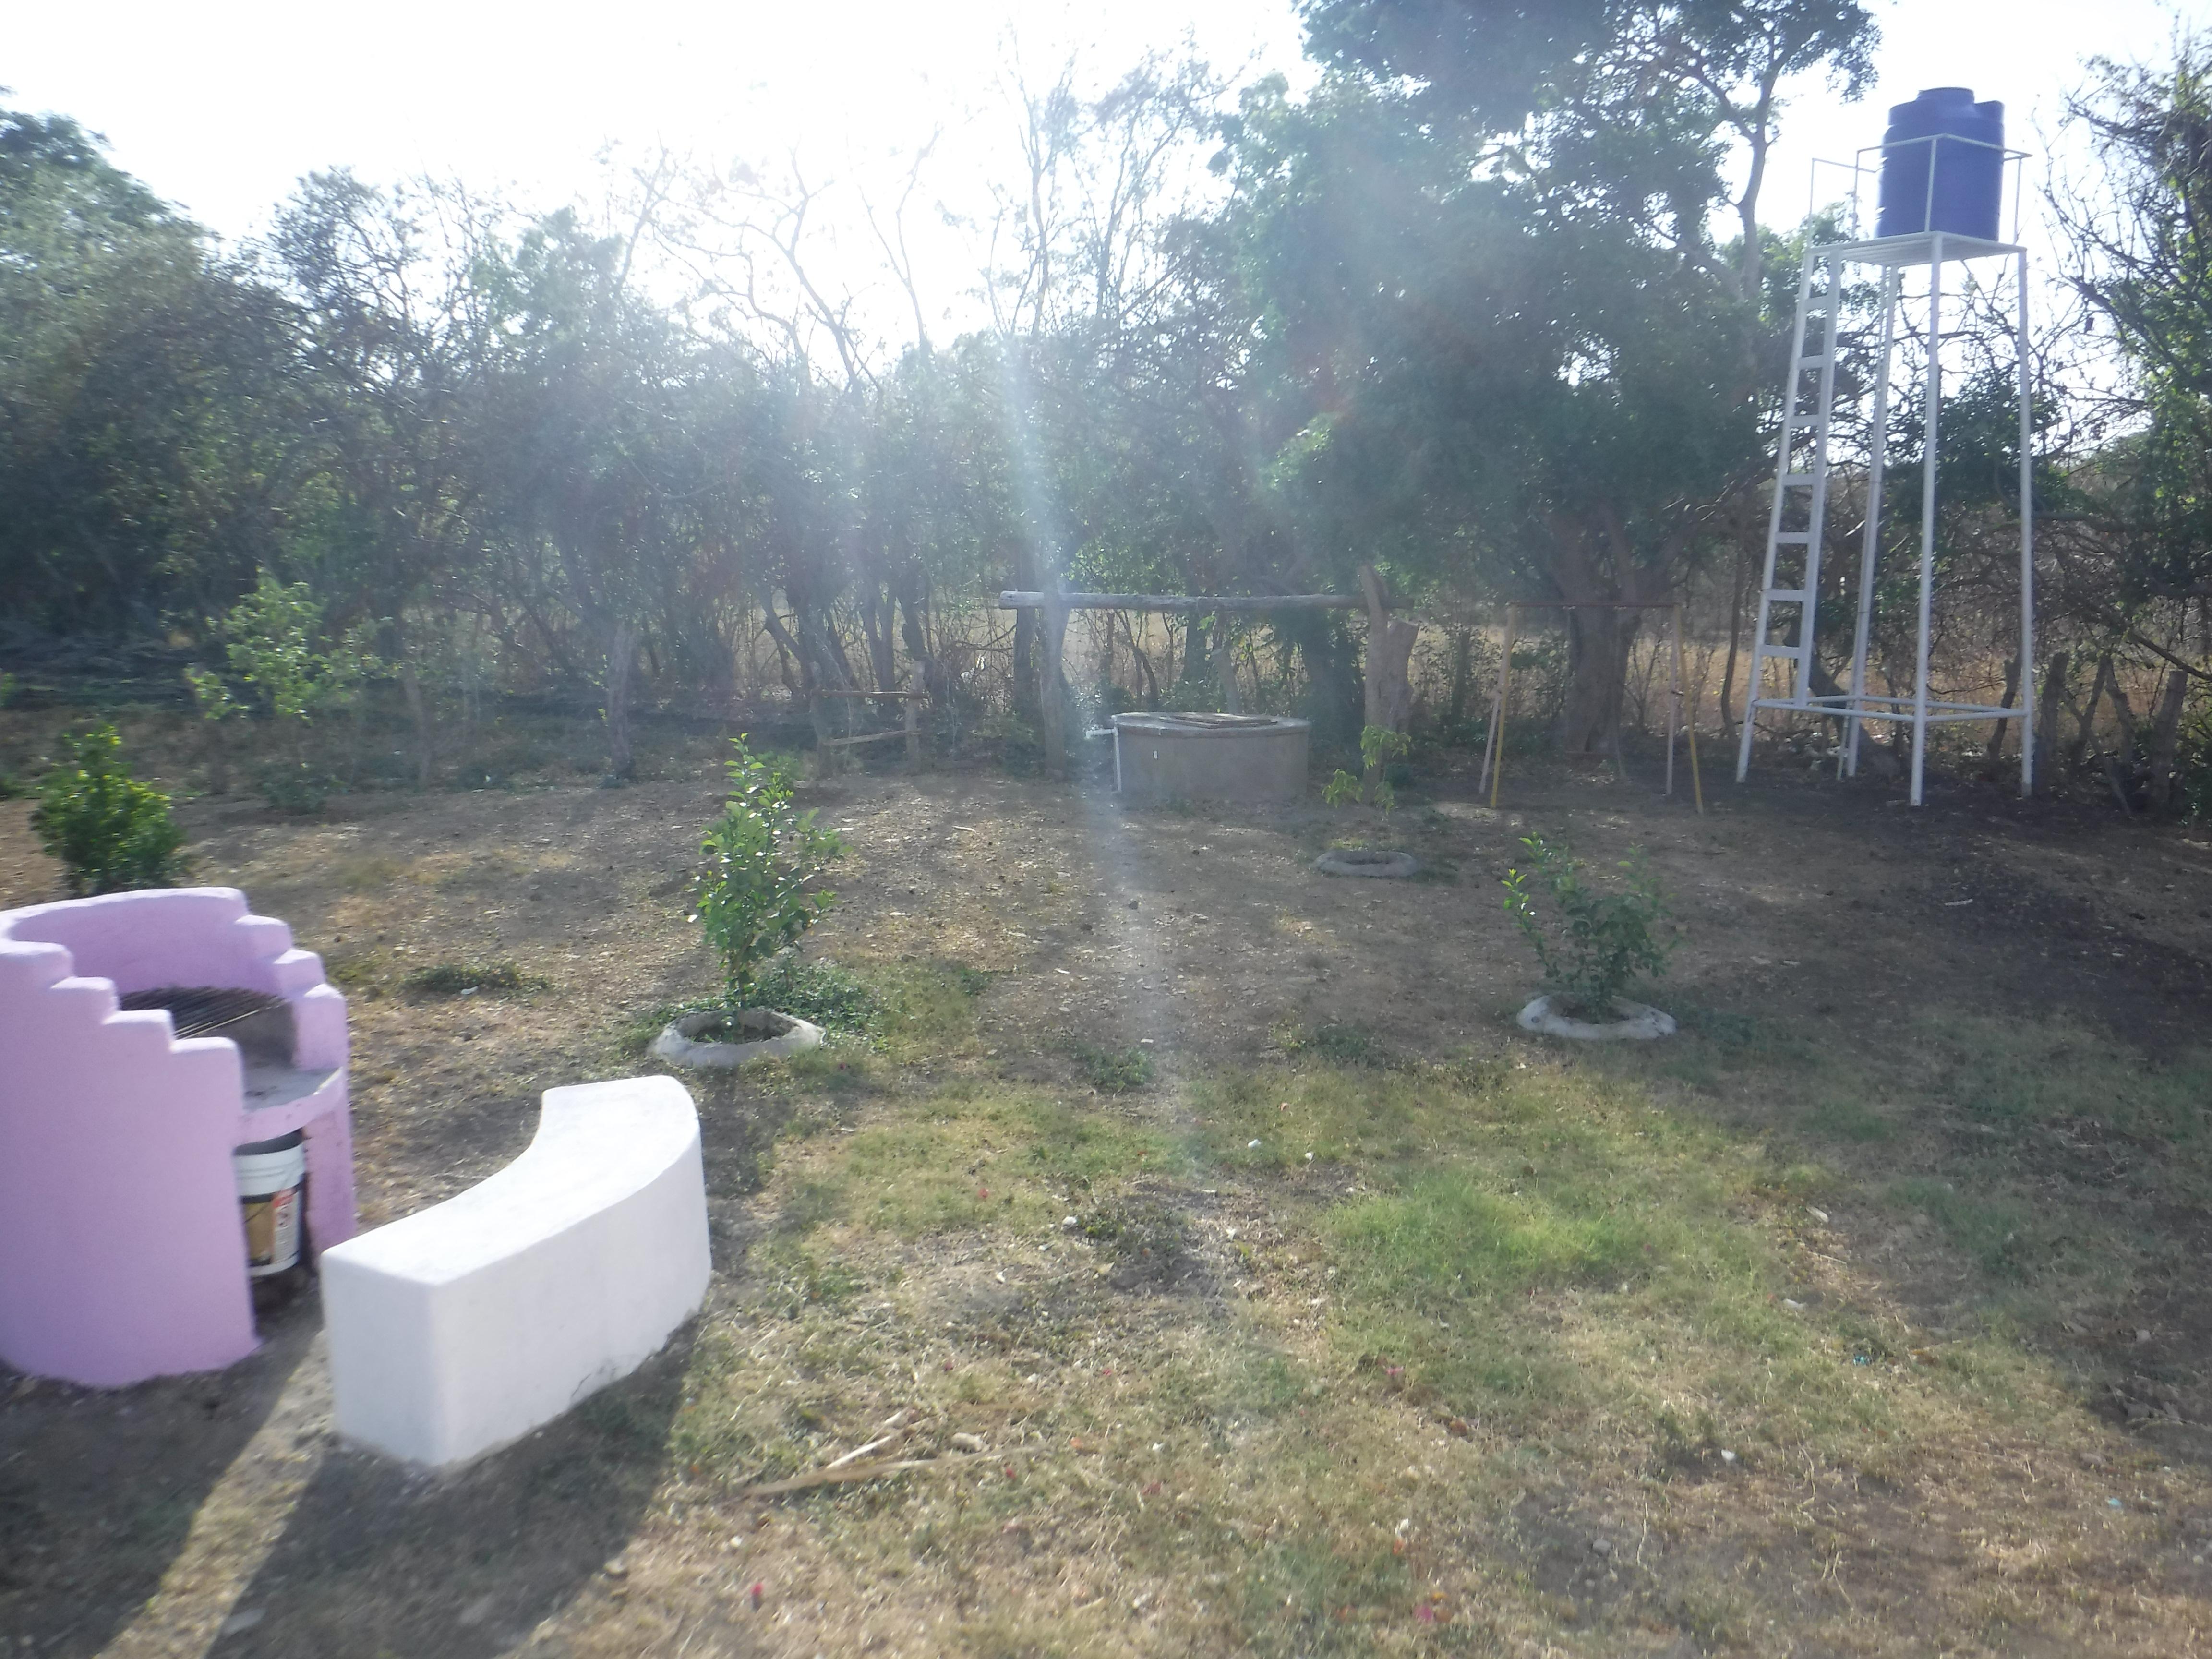 Prado Hills Update and OBrien Delicias Casa 092